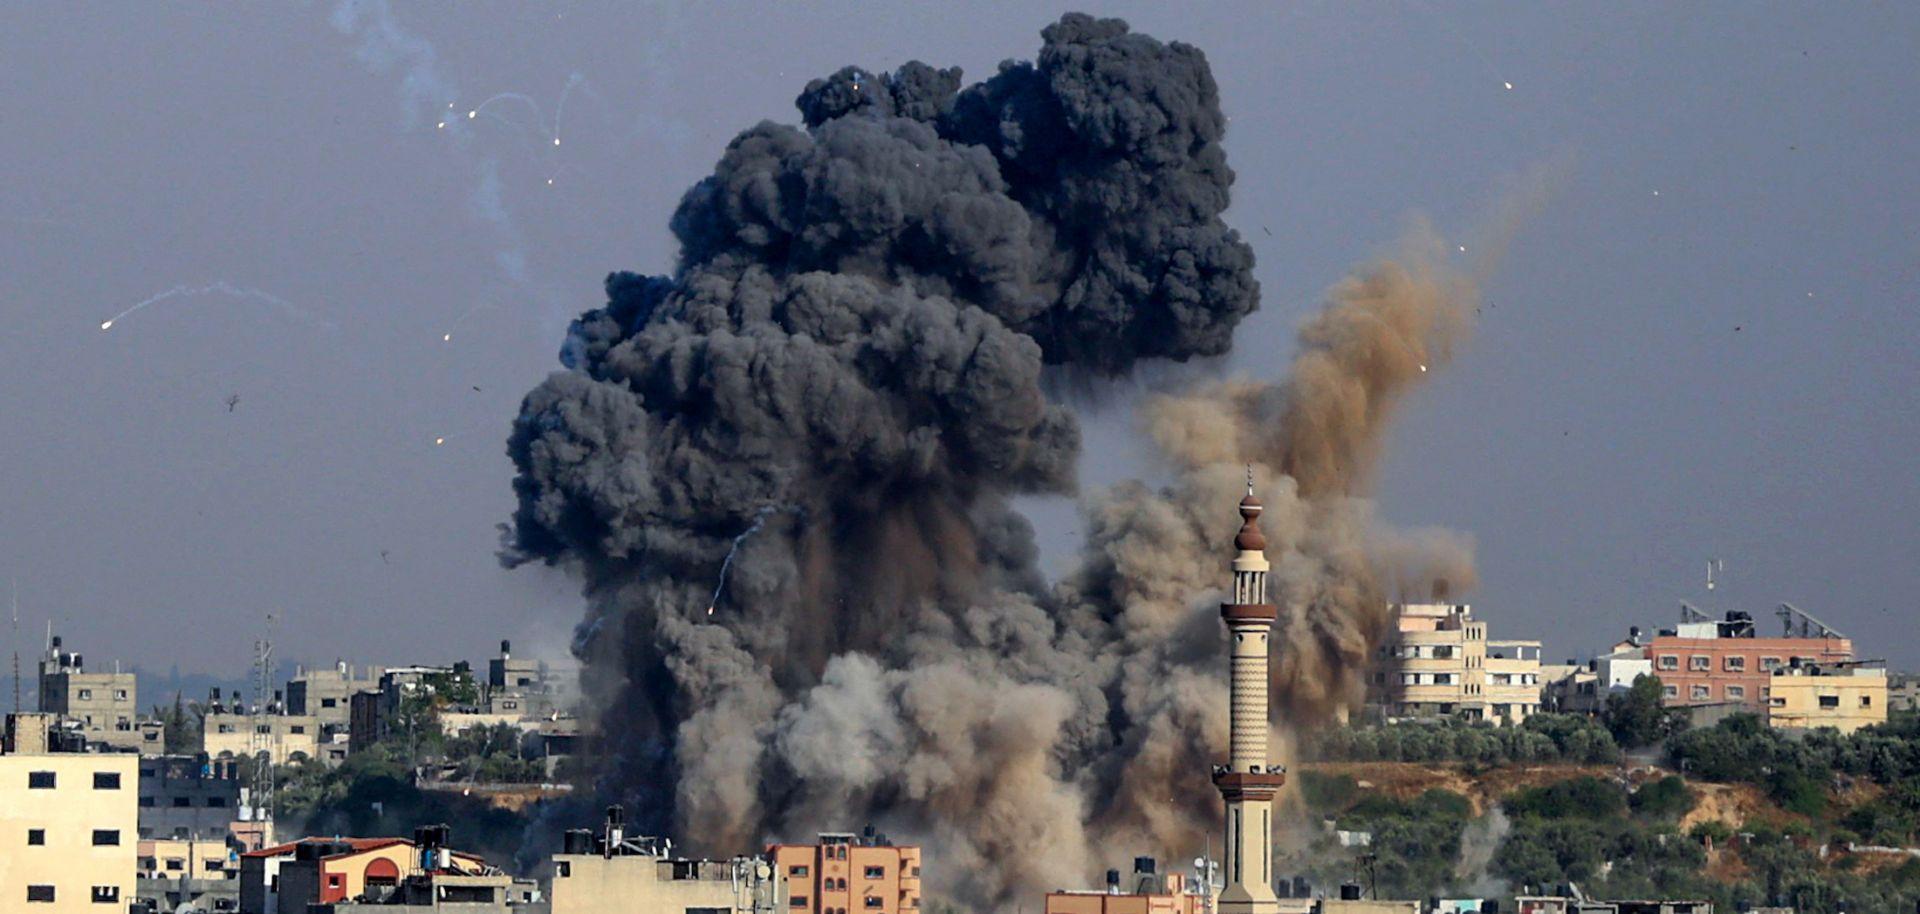 Smoke billows from Israeli airstrikes in Hamas-controlled Gaza City on May 11, 2021.